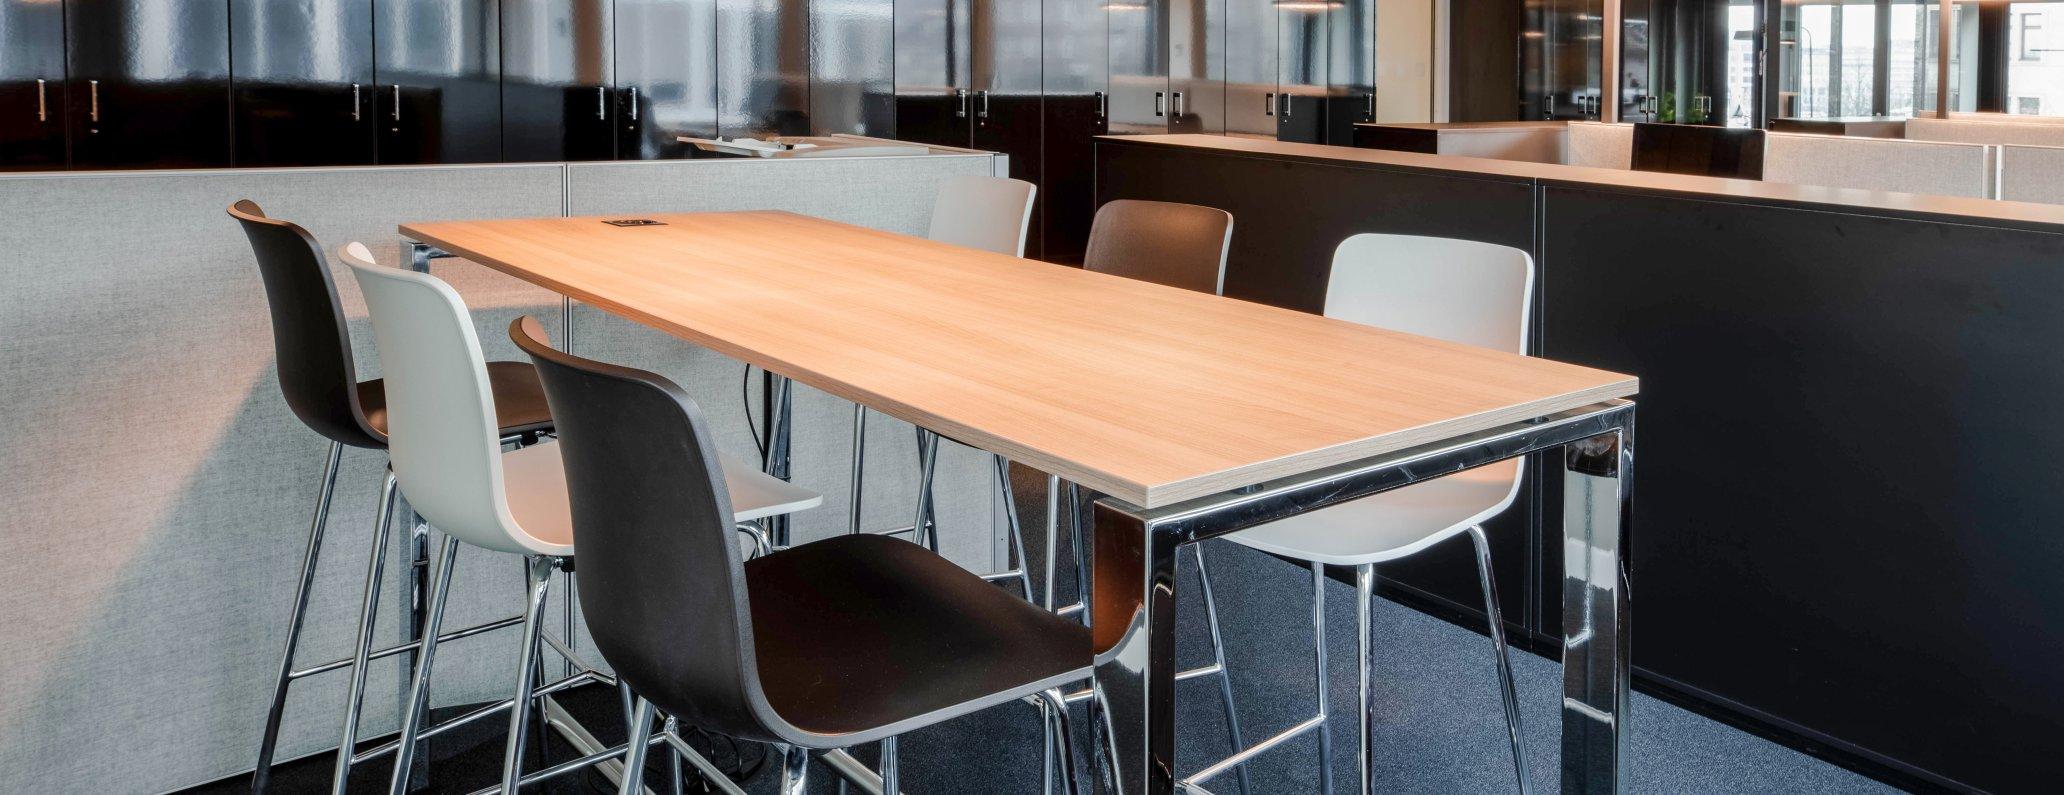 Meeting area TKM Global, Hamburg